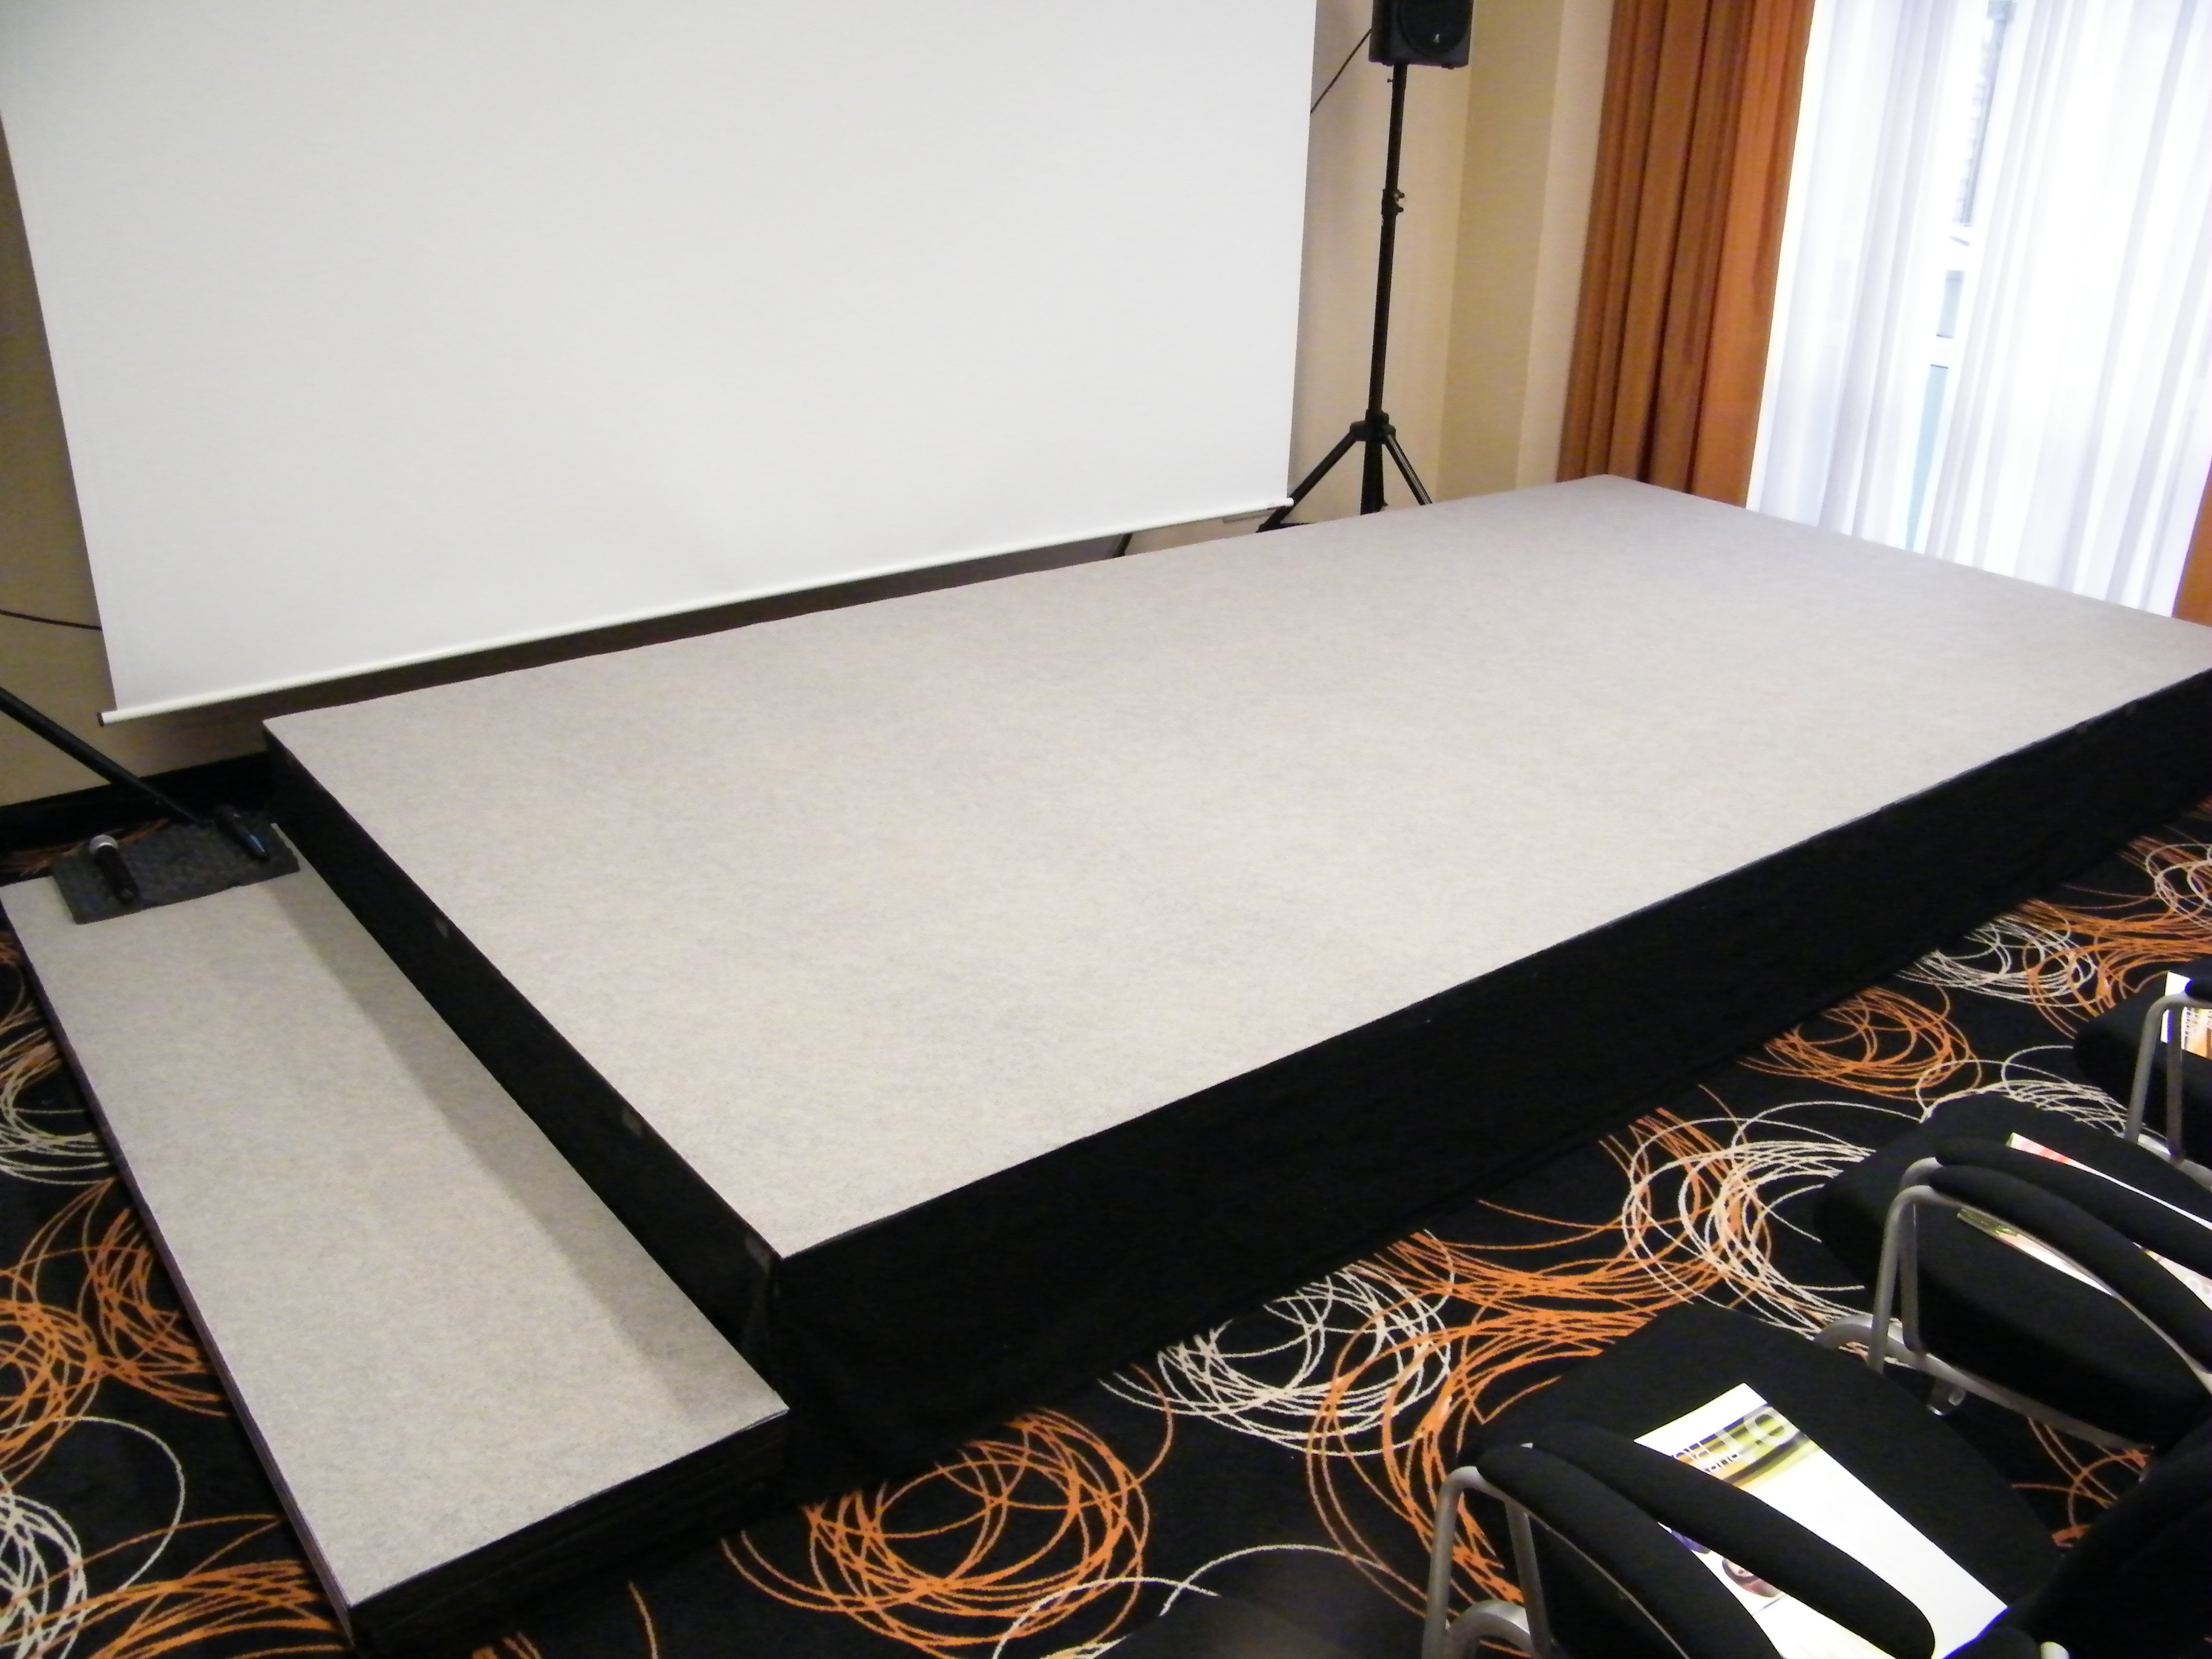 Bühne Hotel Tagung